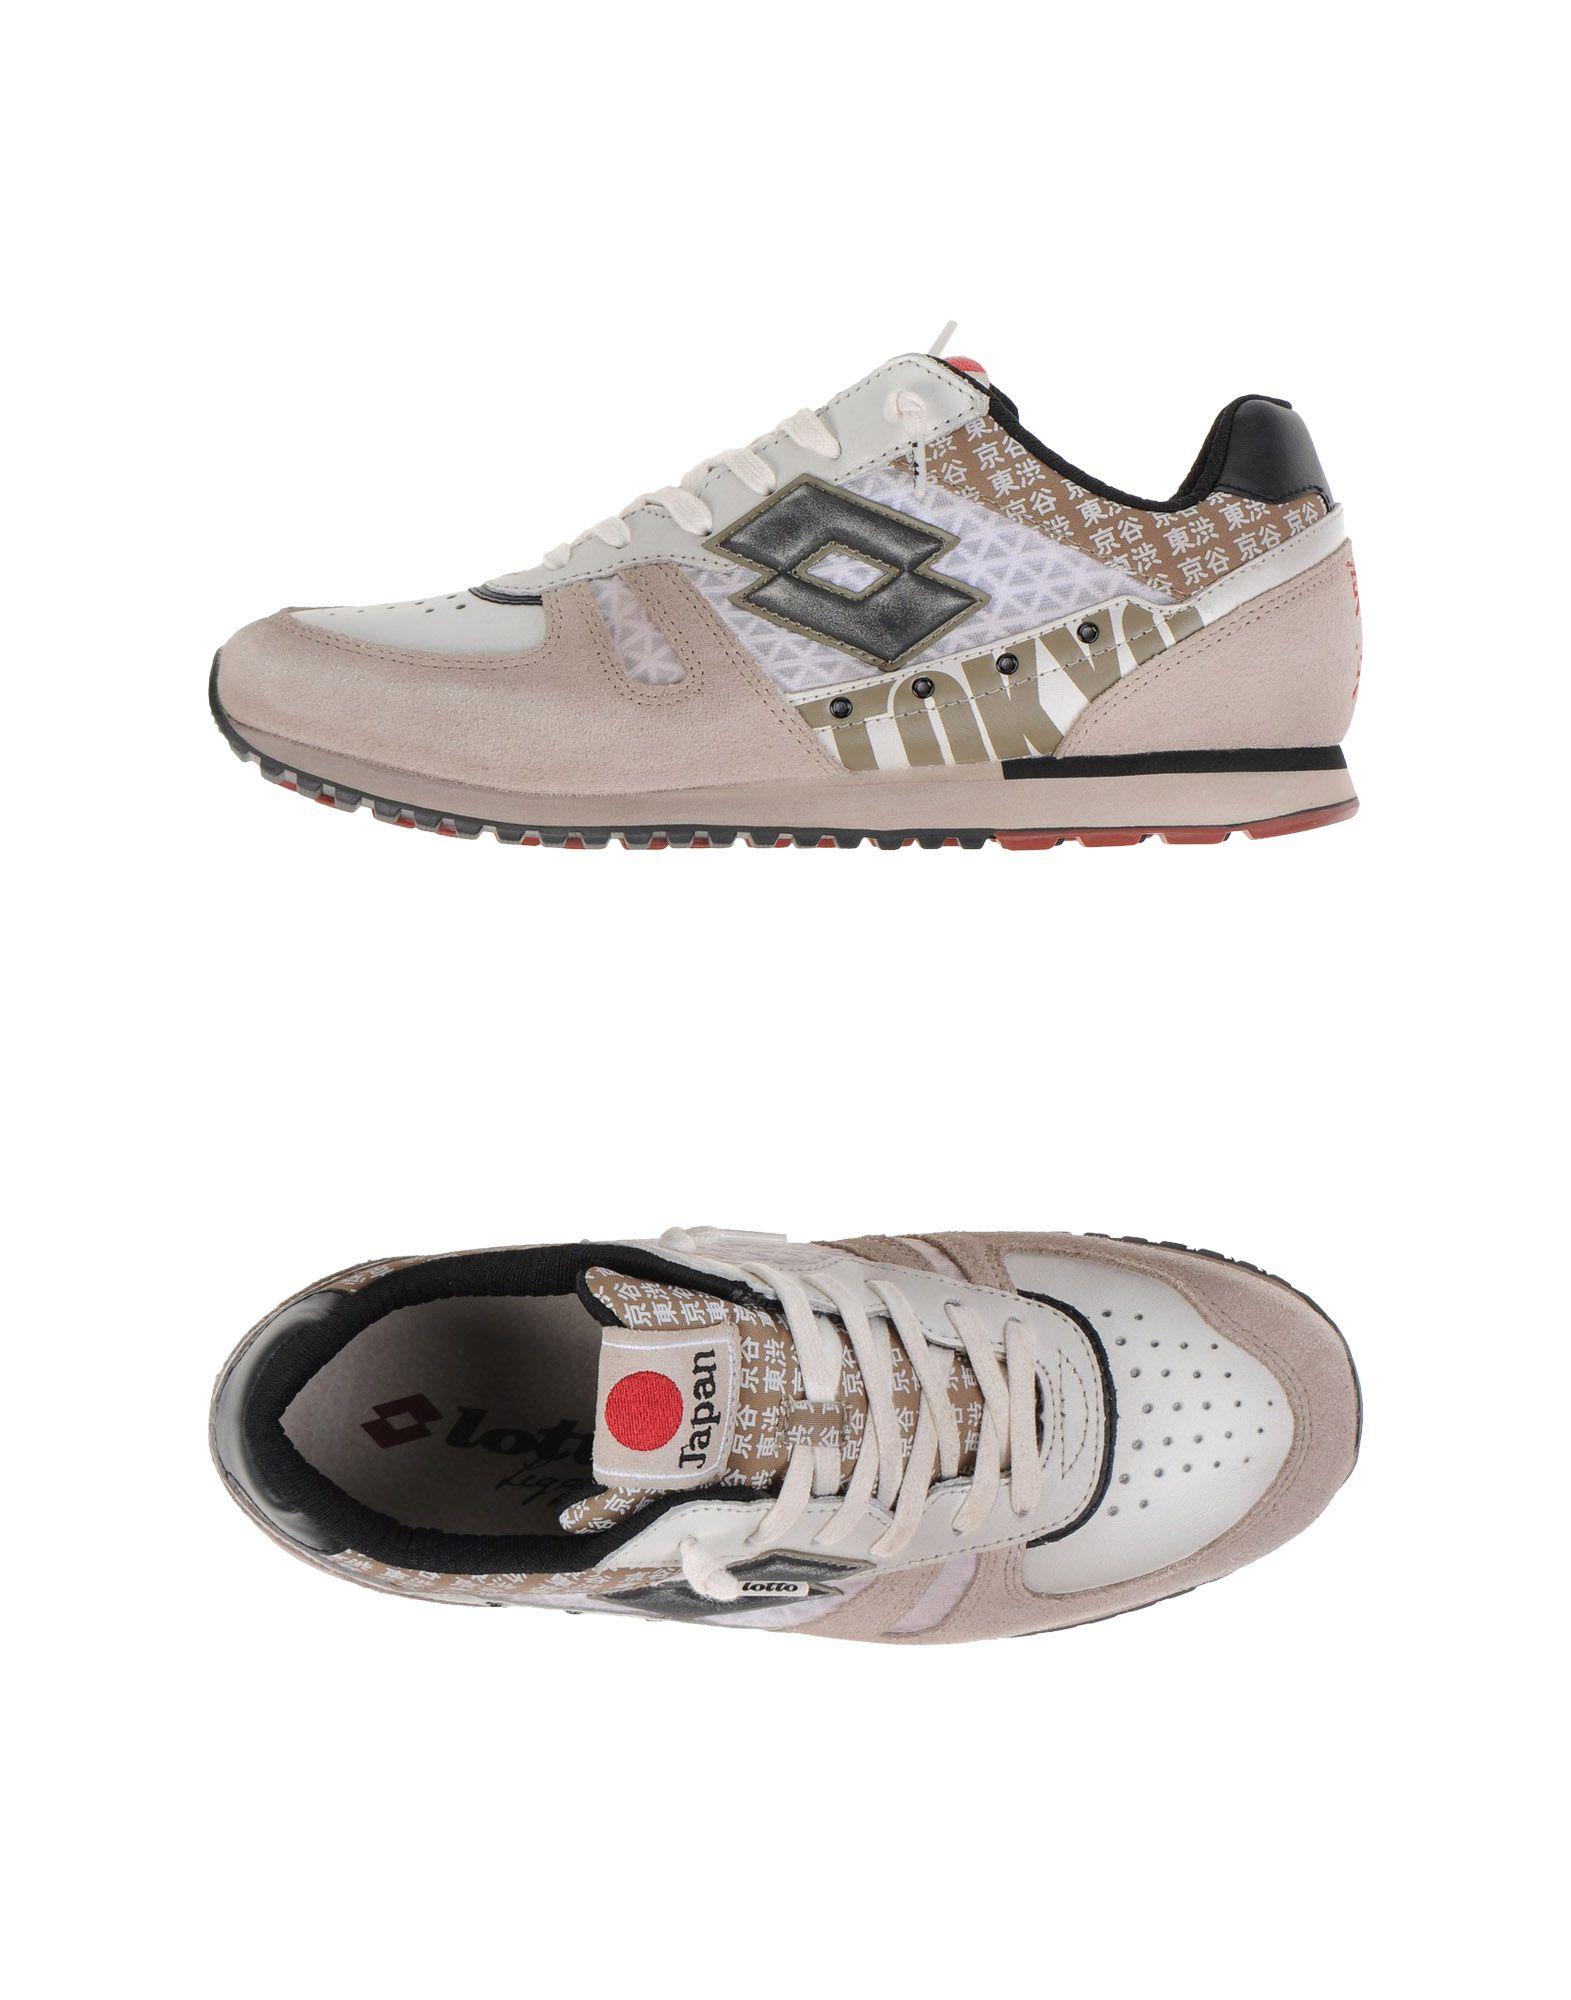 Sneakers Lotto Leggenda Tokyo Shibuya - Homme - Sneakers Lotto Leggenda sur